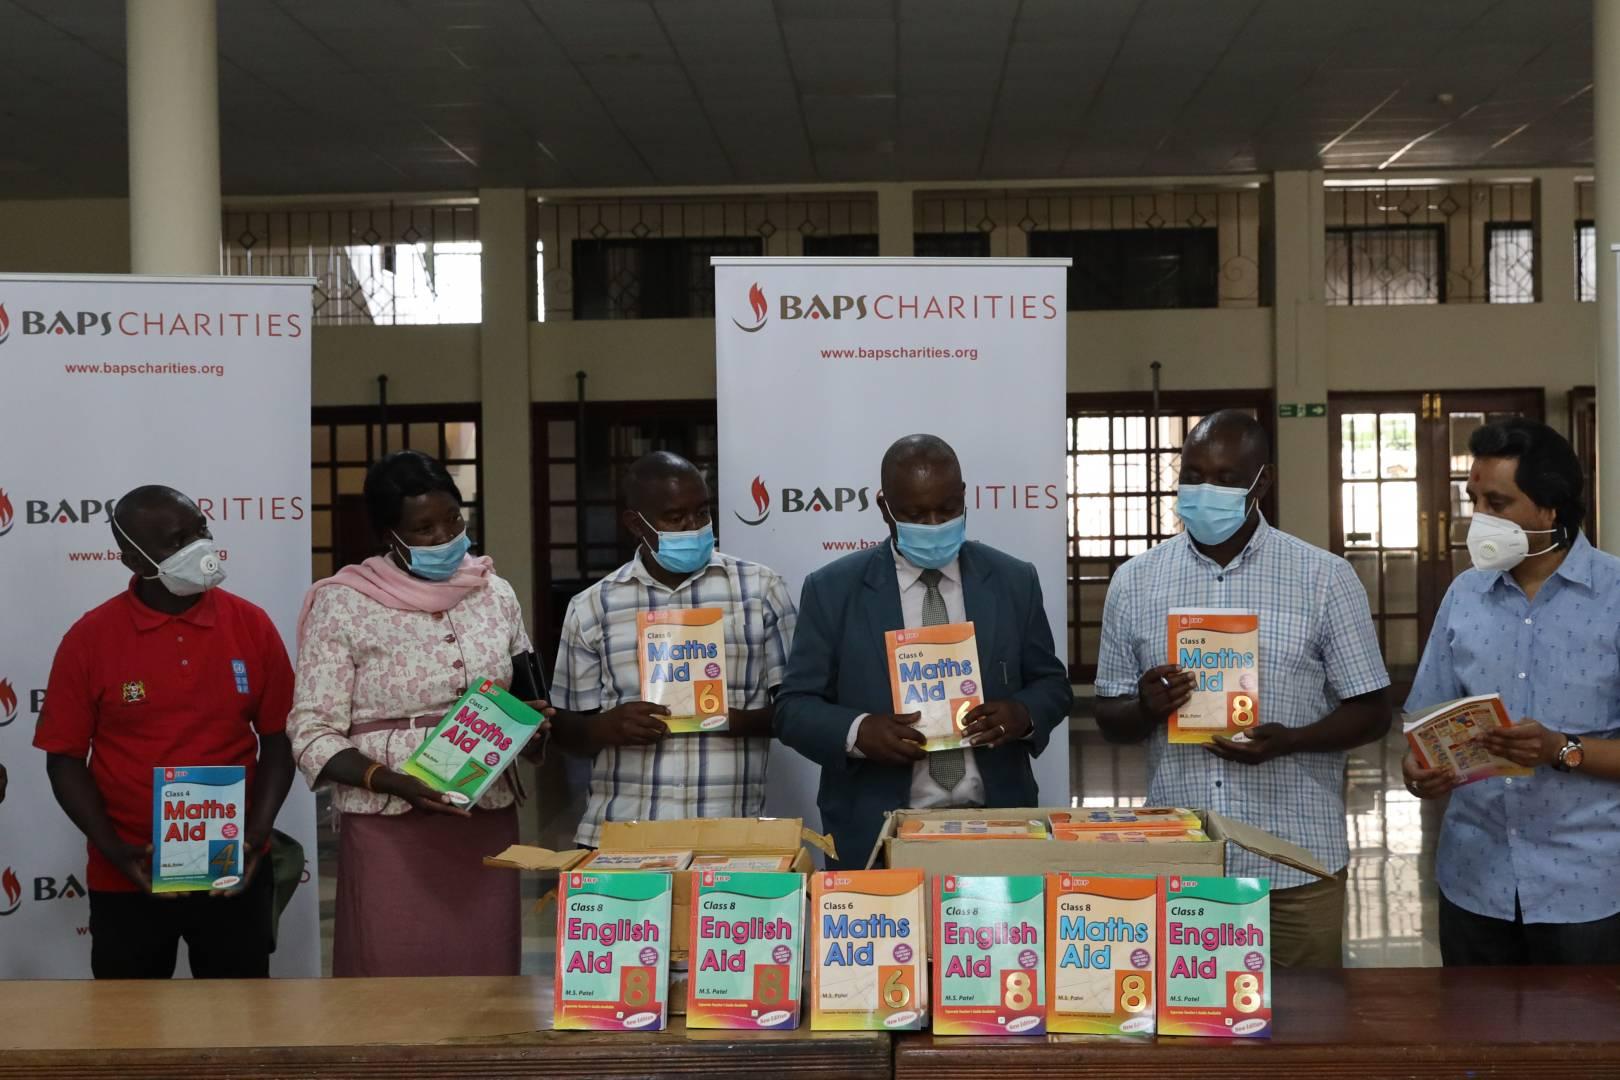 Nairobi_BooksDonations_2020_06